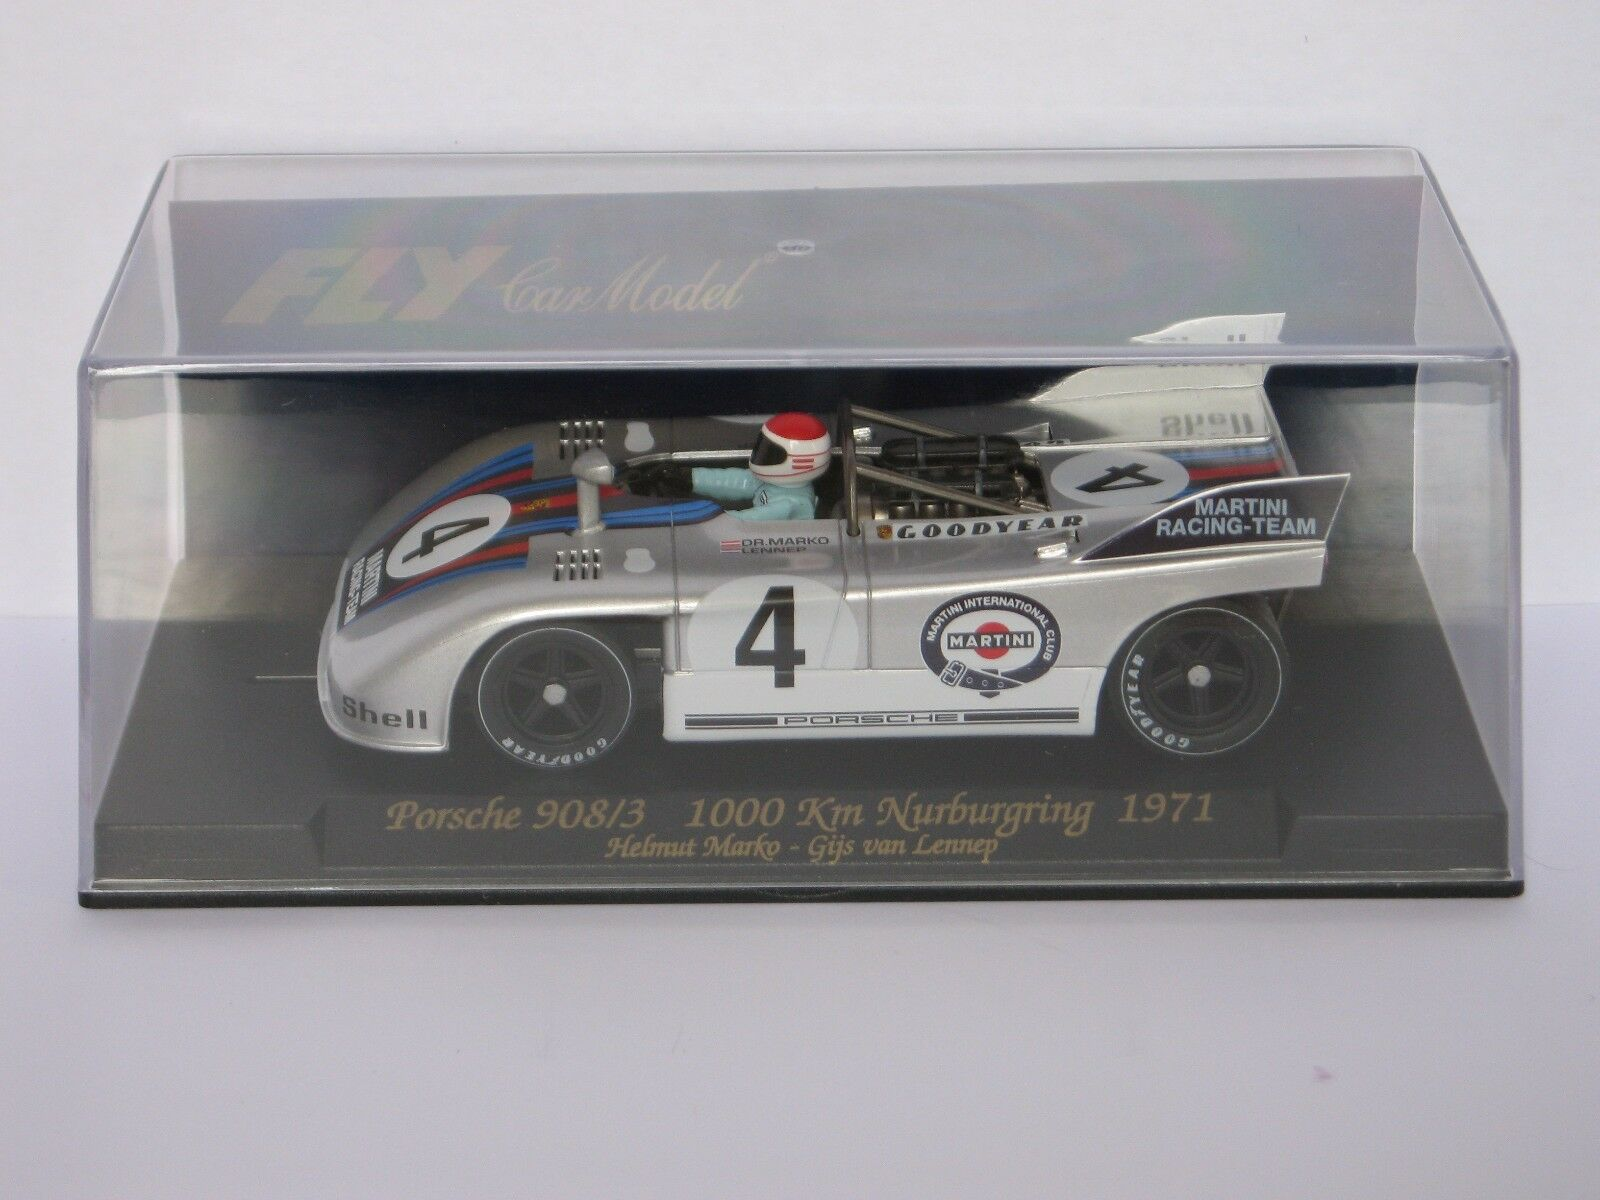 FLY Car Classic Porsche 908 3 1000 Km Nurburgring 1971 Ref. C63